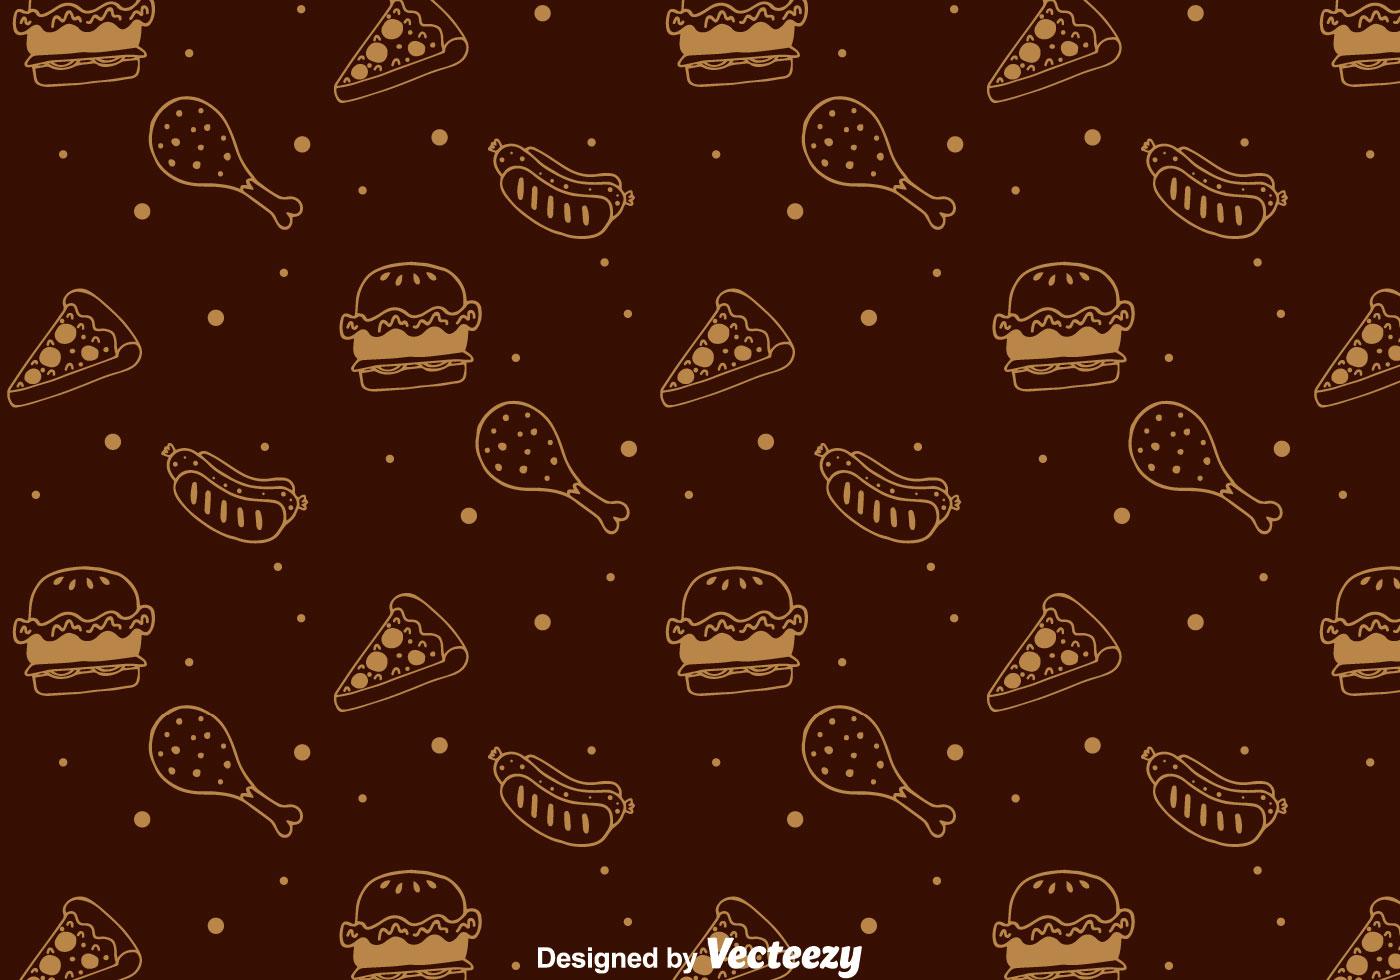 Pizza Wallpaper Cute Hand Drawn Fast Food Pattern Download Free Vector Art